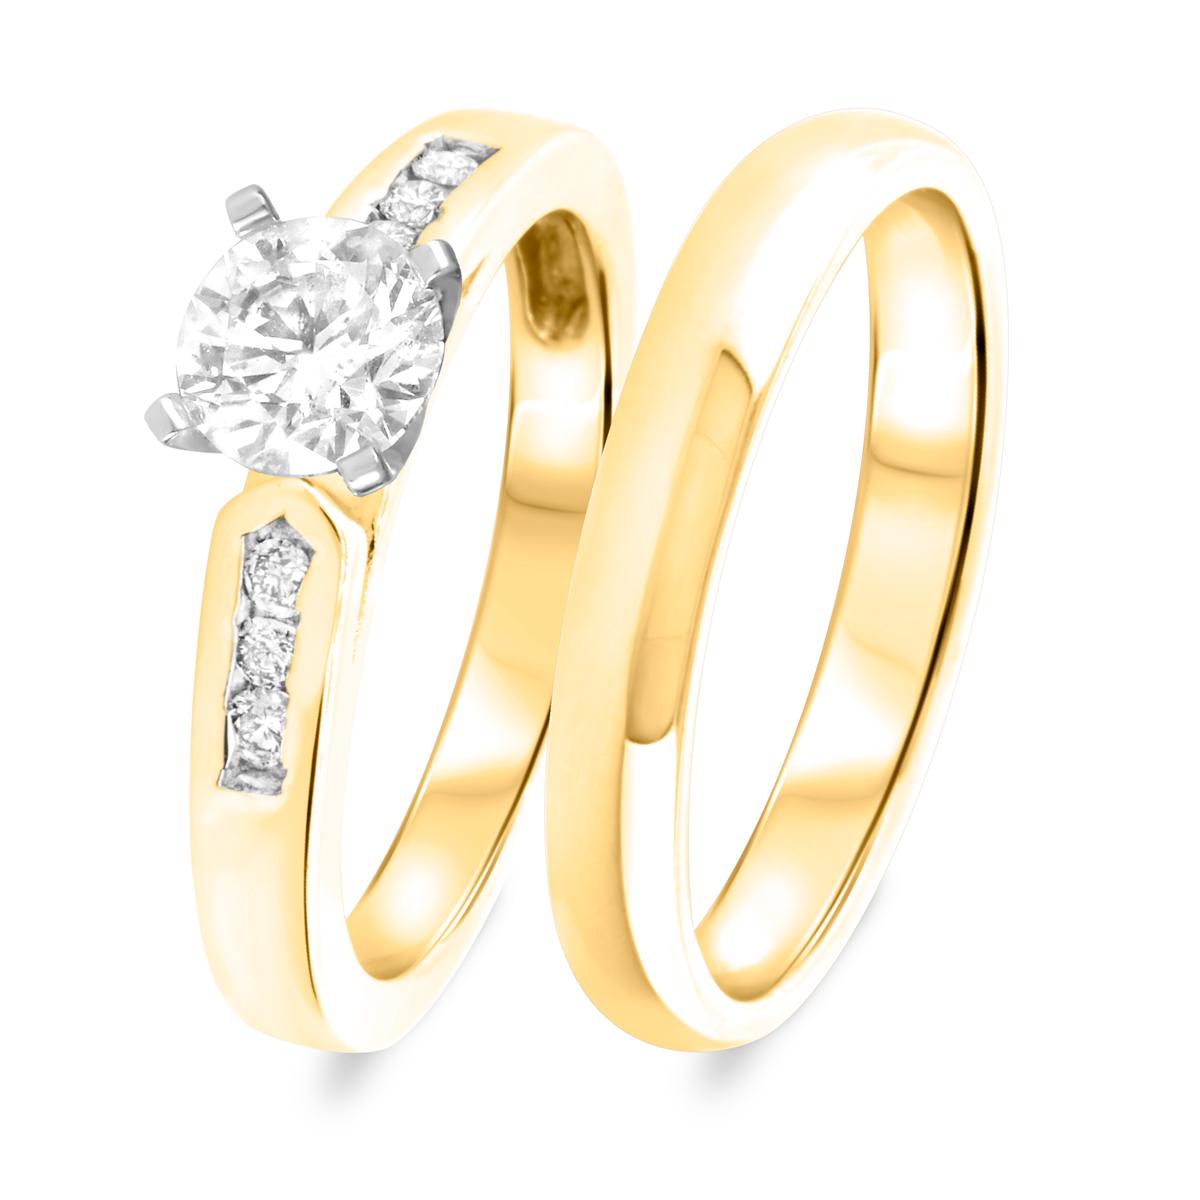 1 1/4 CT. T.W. Diamond Women's Bridal Wedding Ring Set 14K Yellow Gold